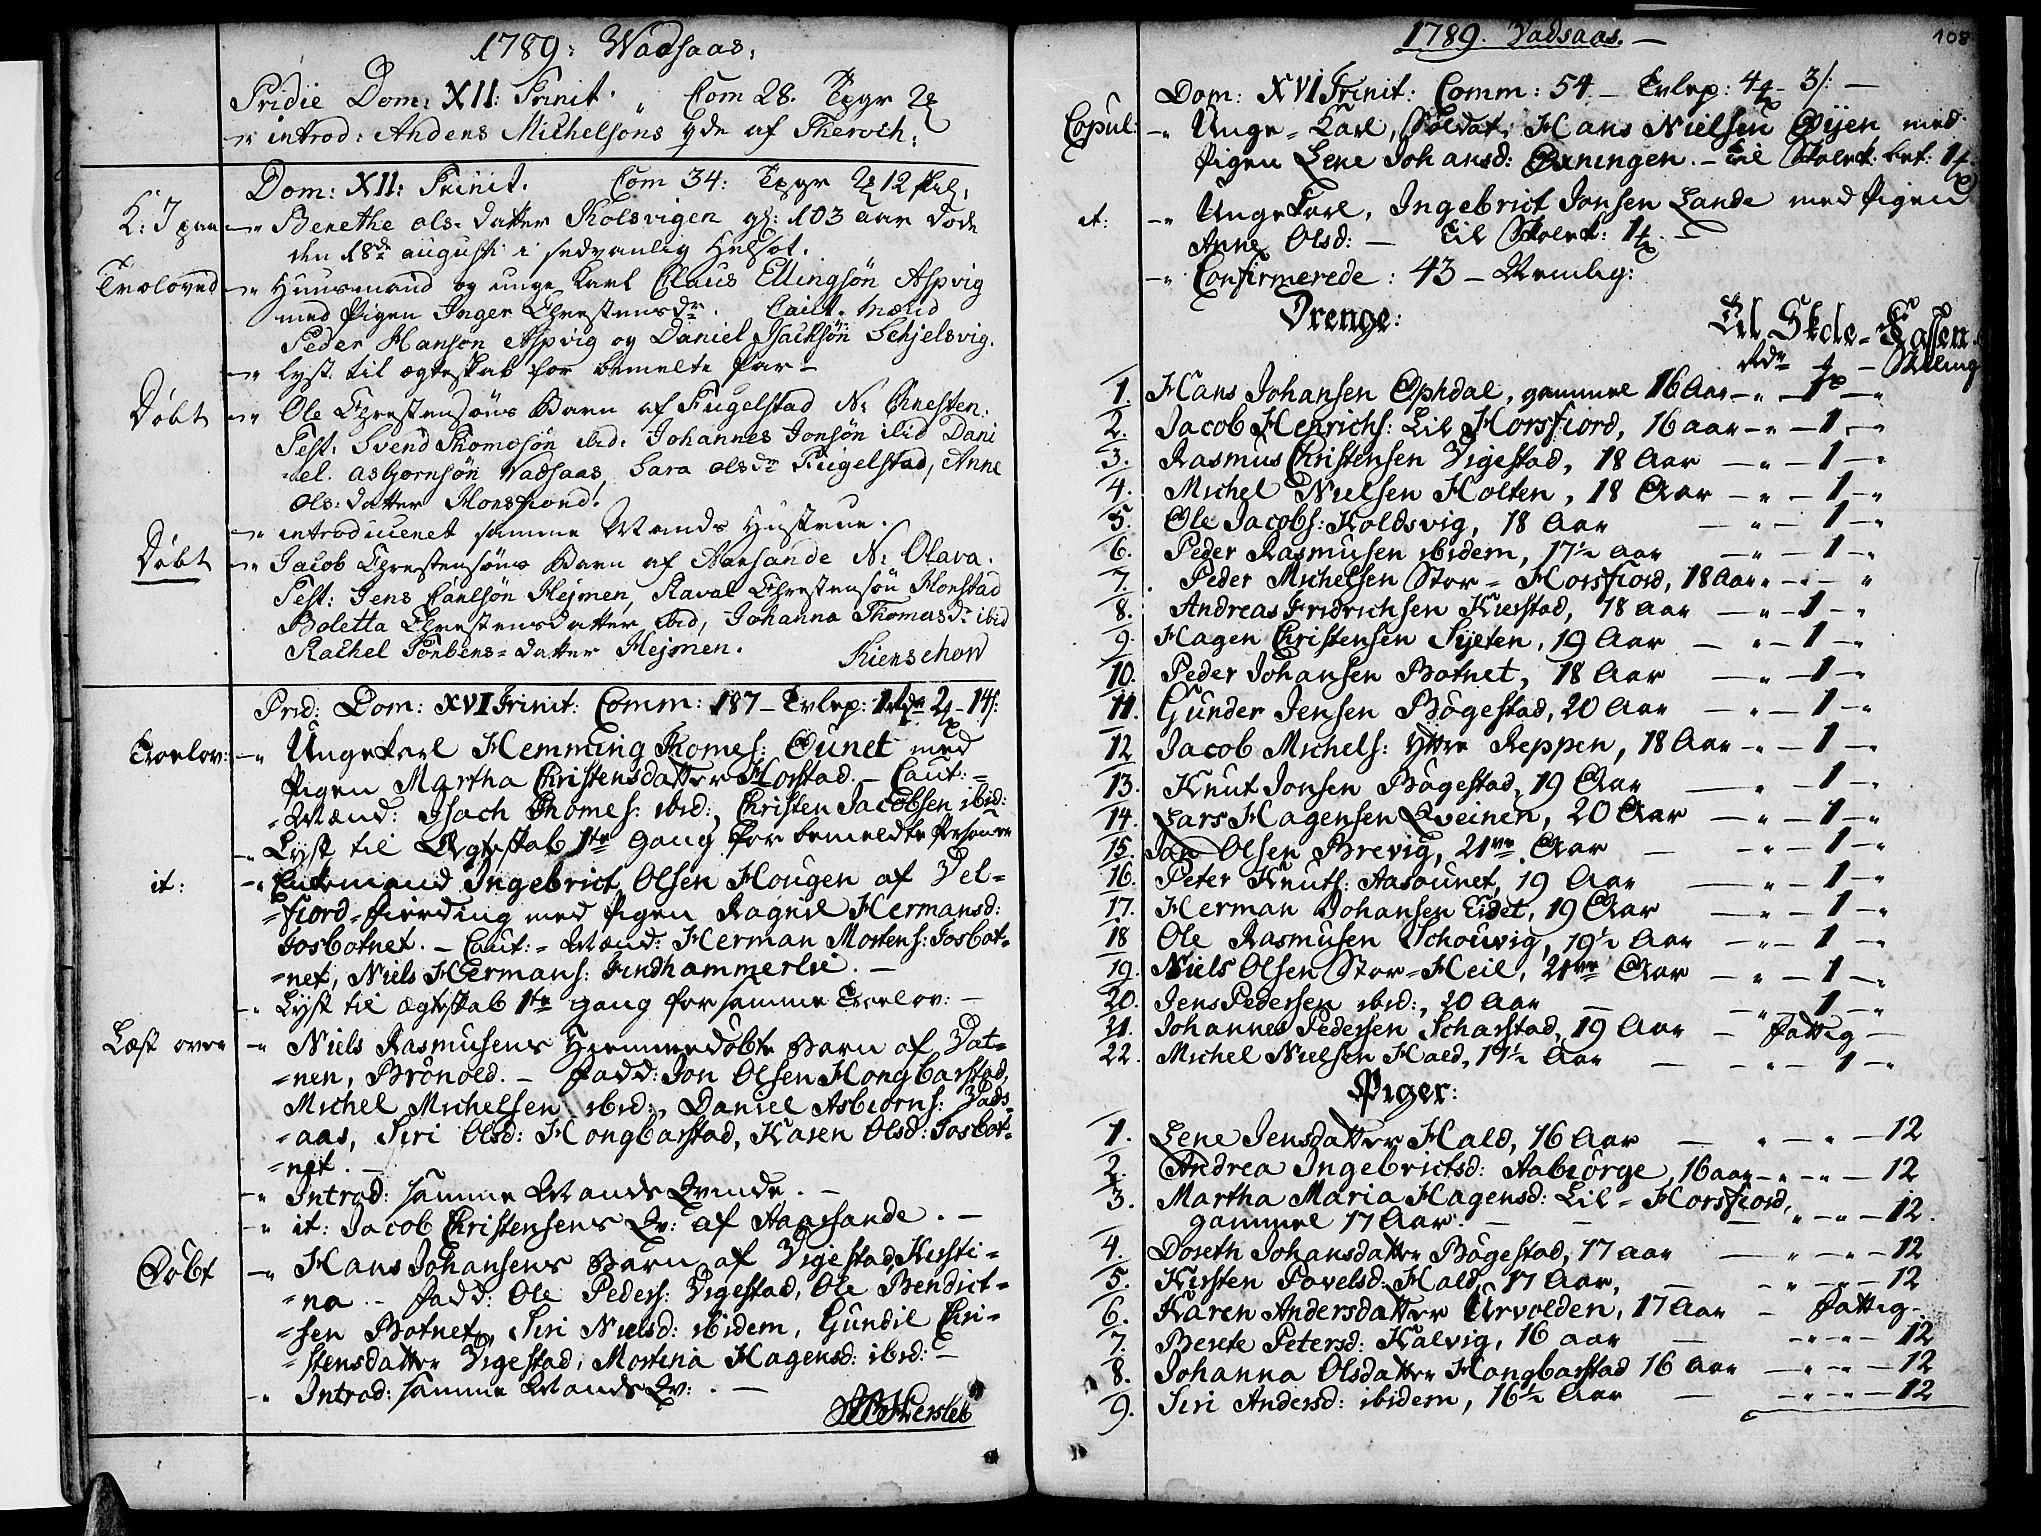 SAT, Ministerialprotokoller, klokkerbøker og fødselsregistre - Nordland, 810/L0137: Ministerialbok nr. 810A01, 1752-1817, s. 108